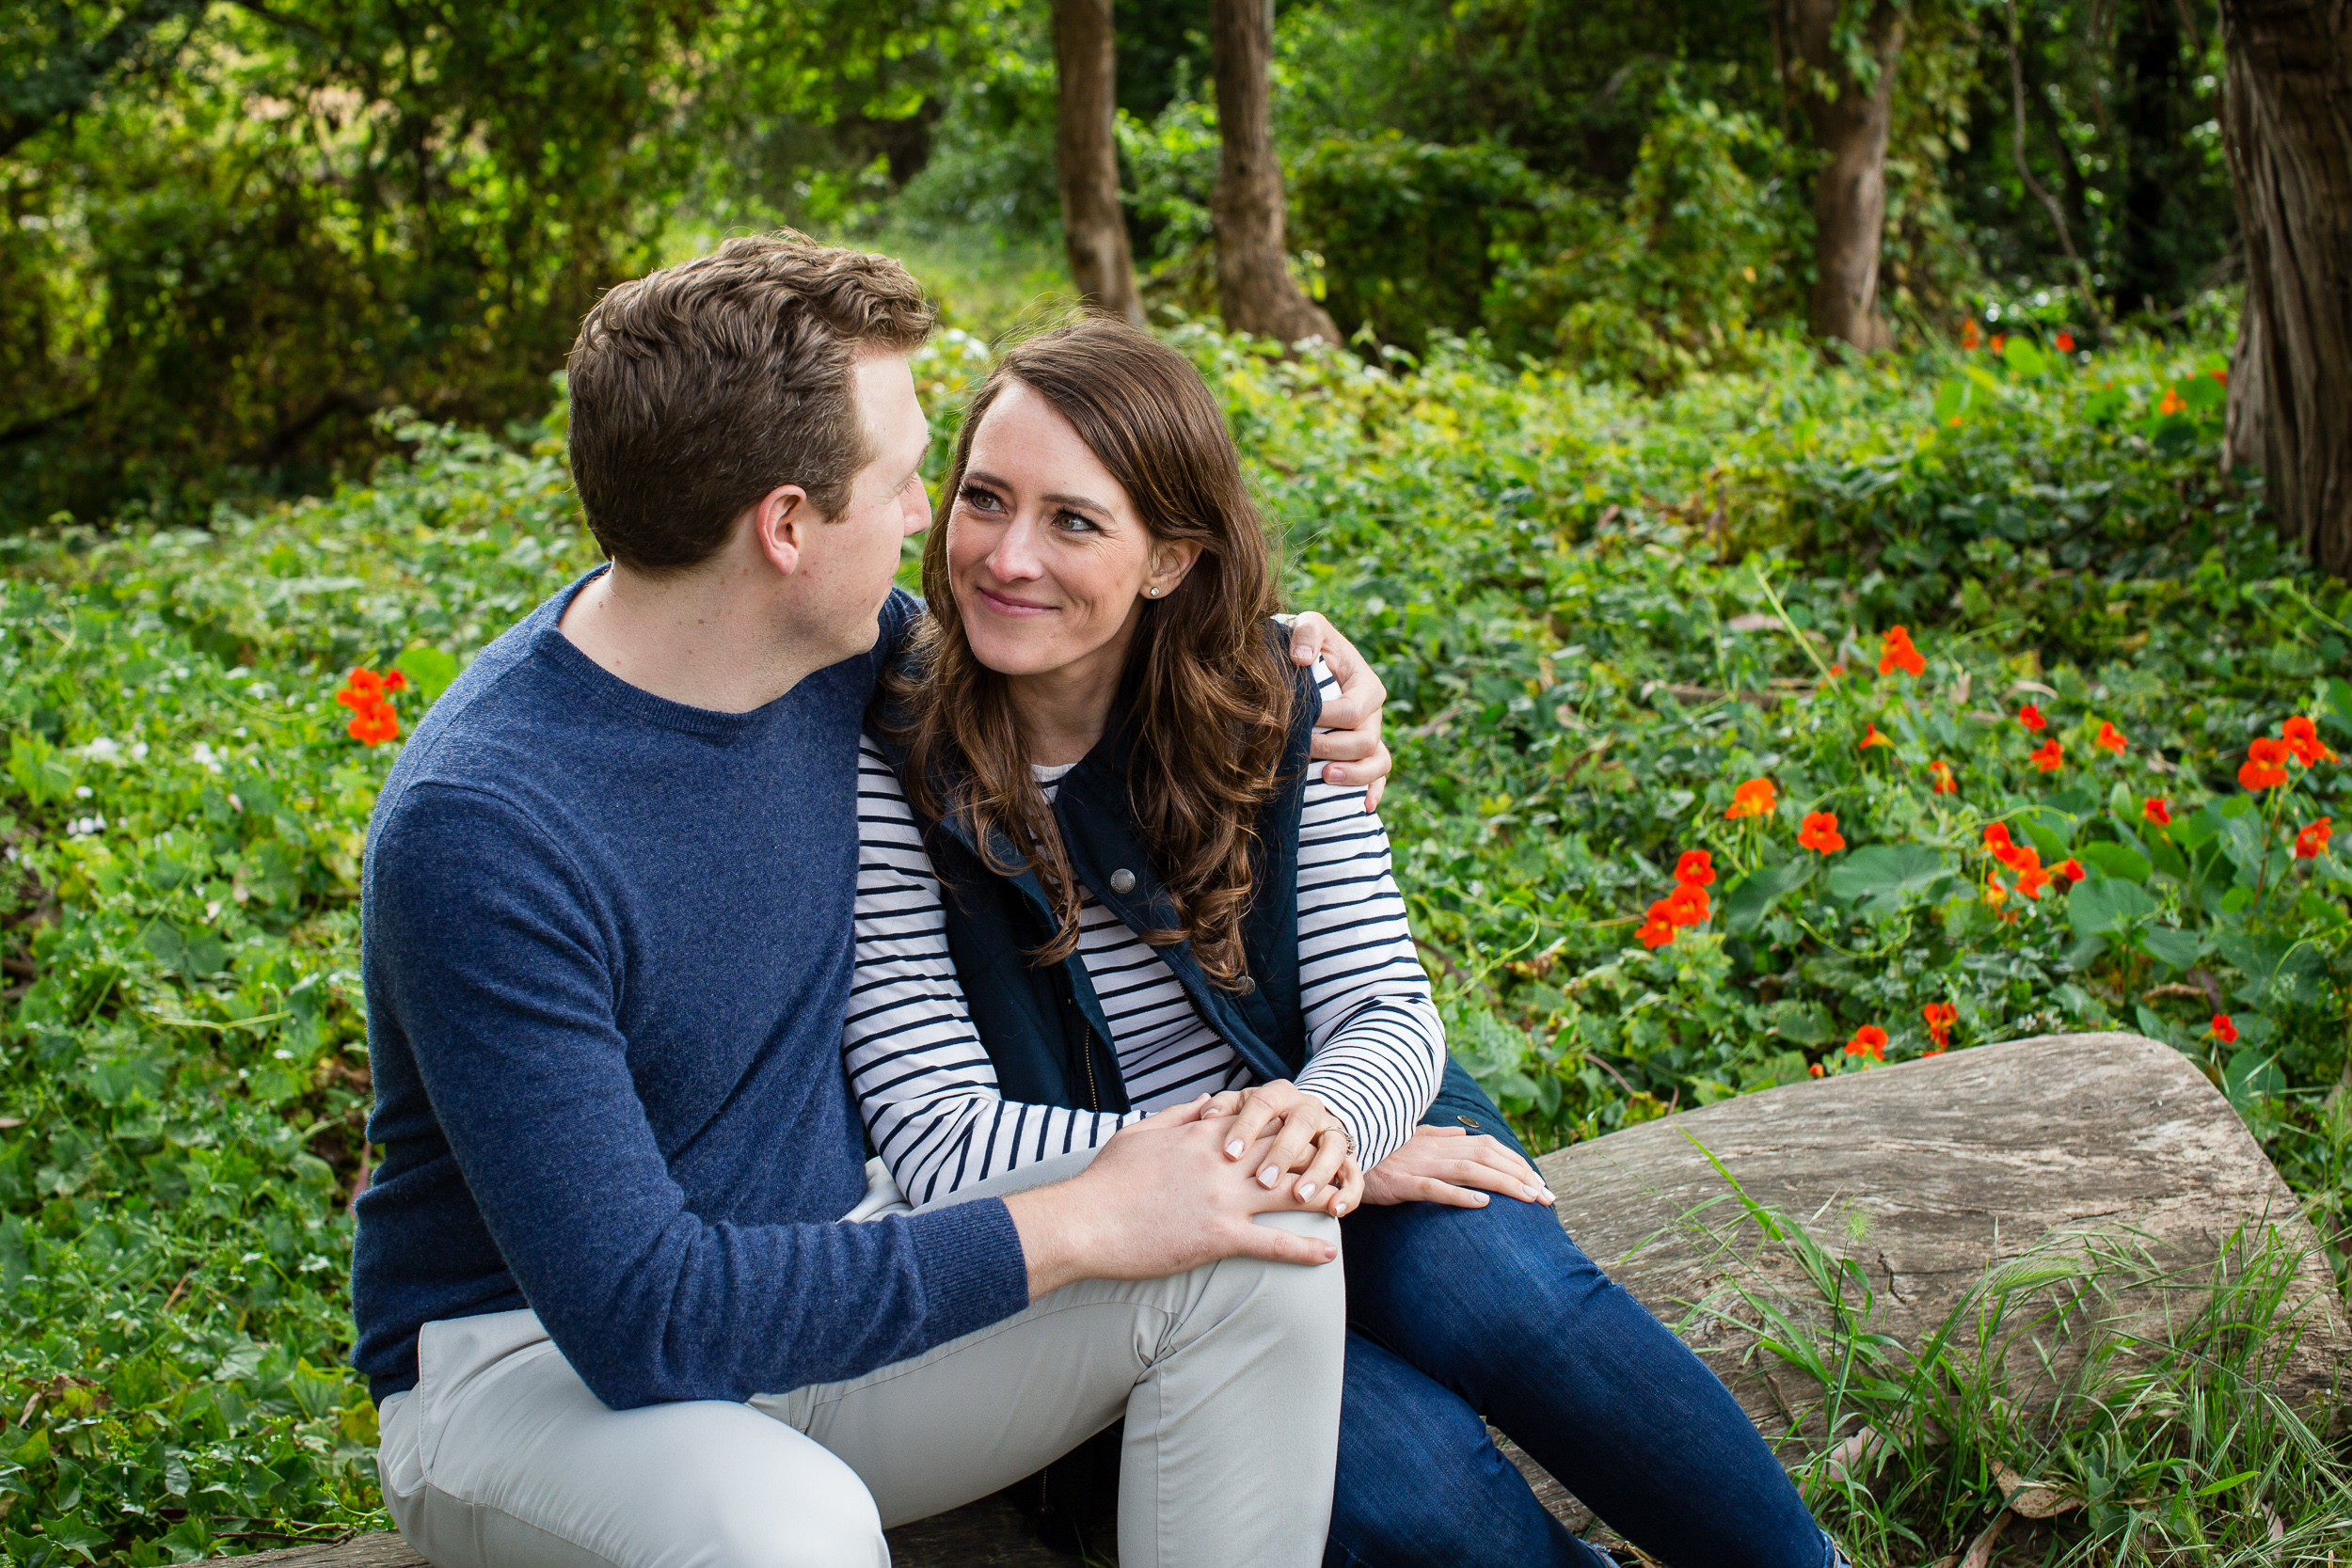 engagementsession.sanfrancisco.emilymerrillweddings.0022.jpg